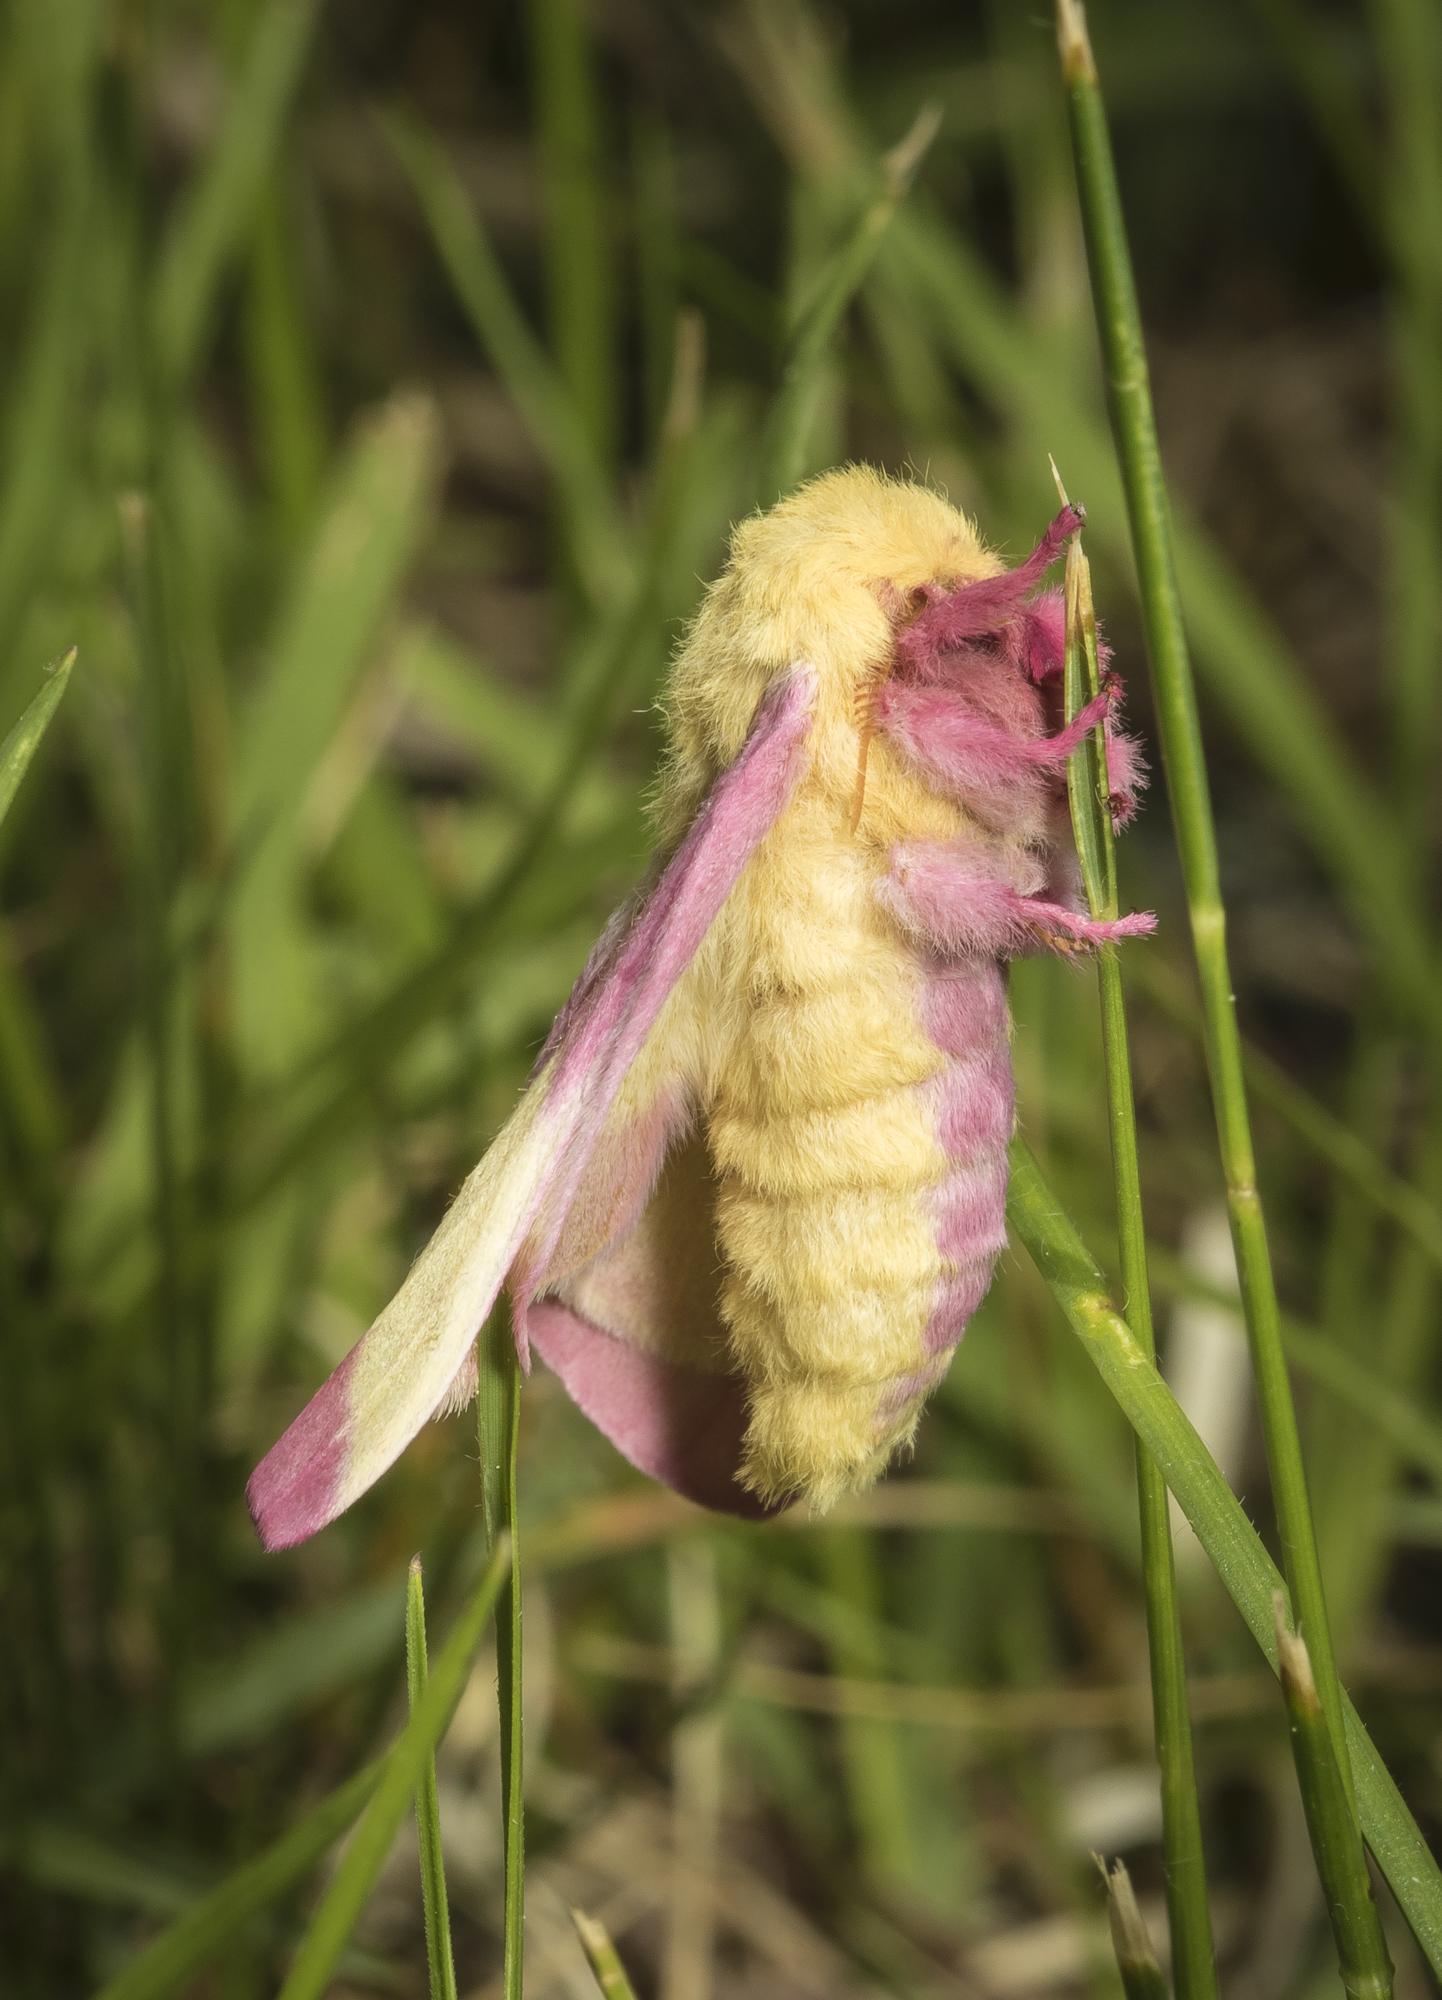 rosy maple moth emerging